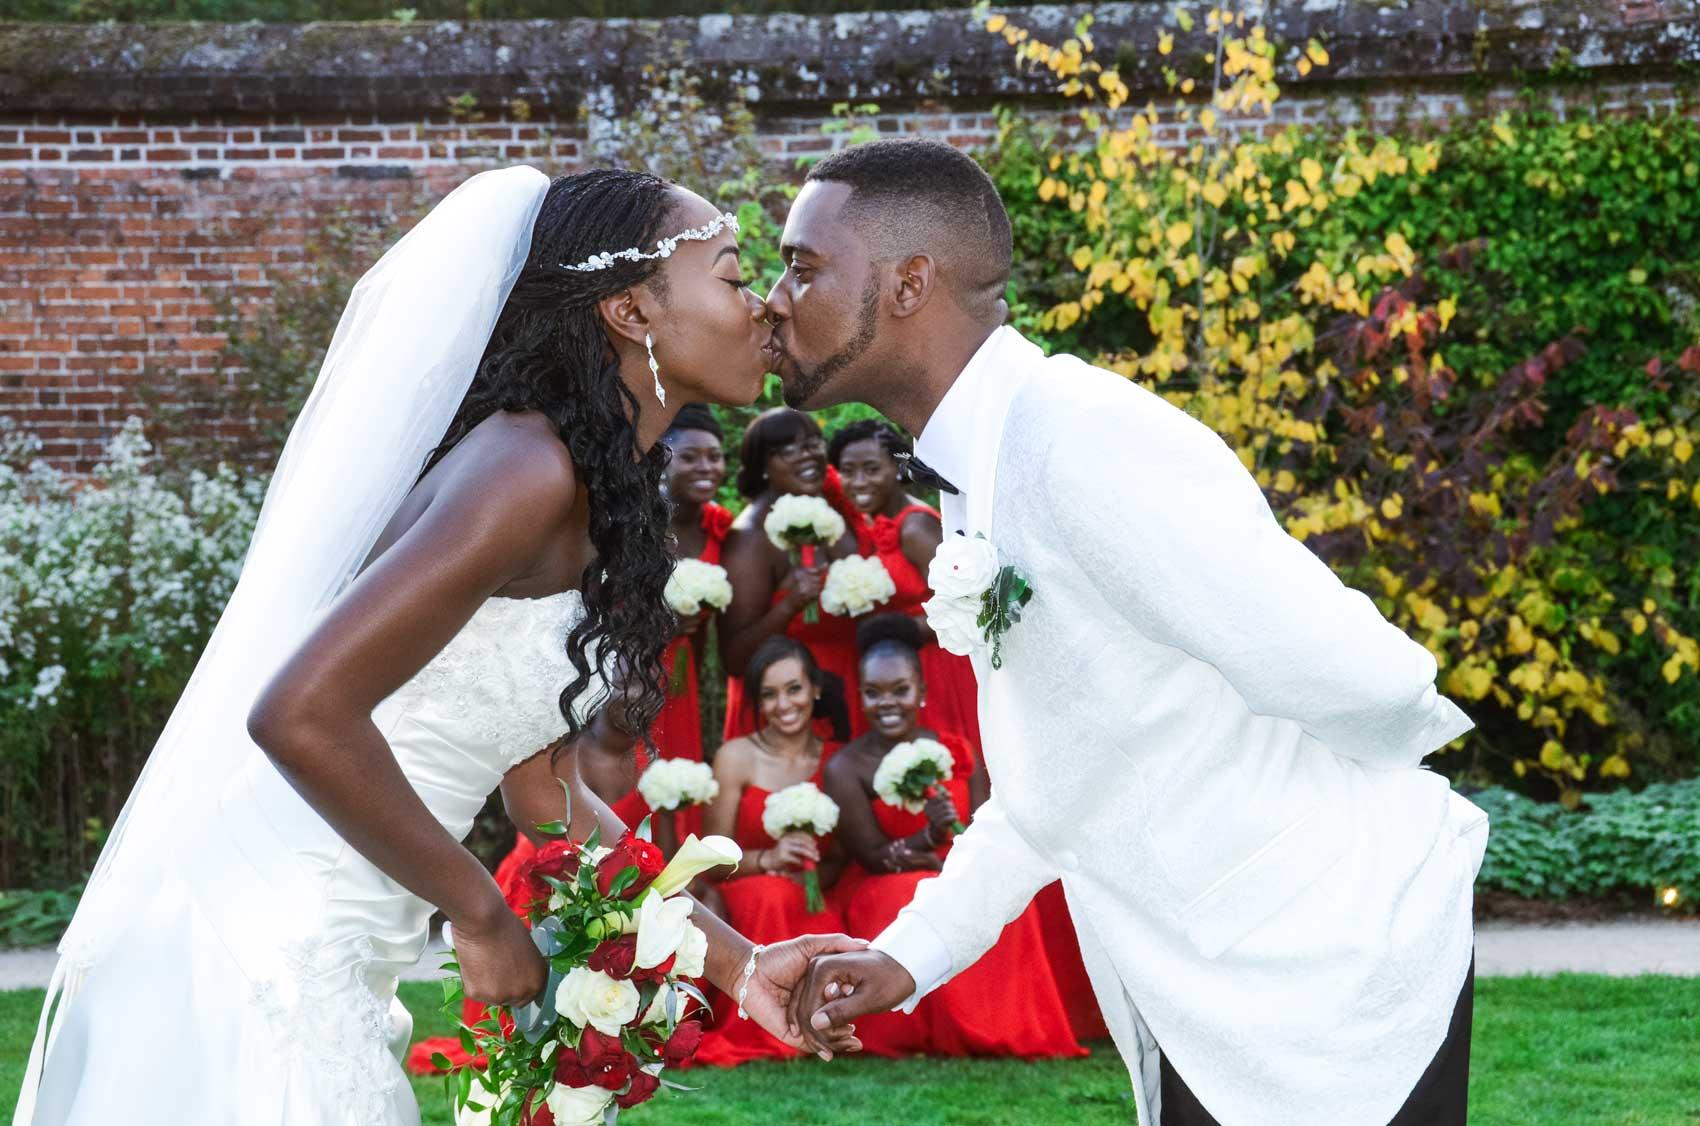 Wedding Photographers Painshill